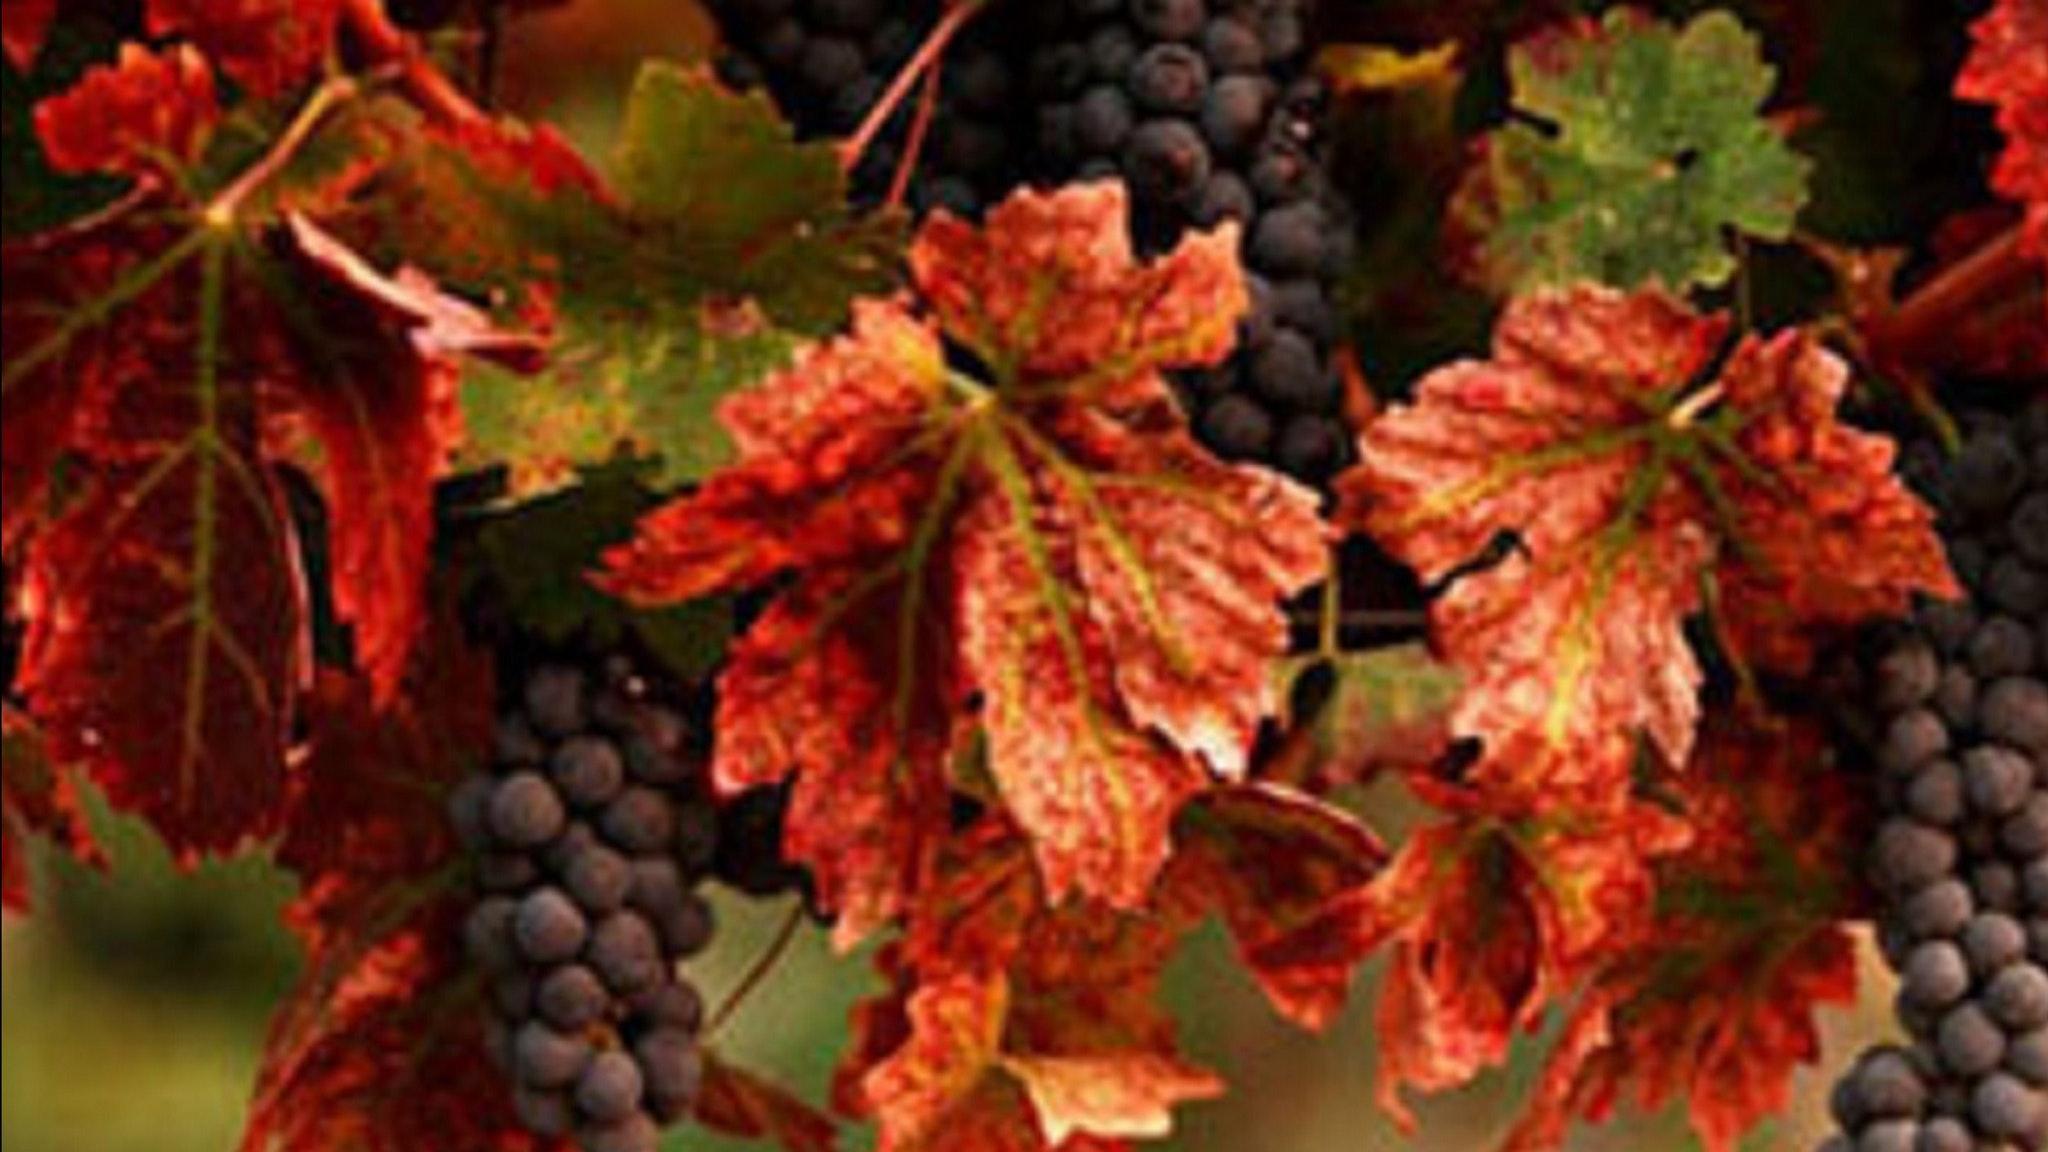 Moorabool Valley Winery Tours